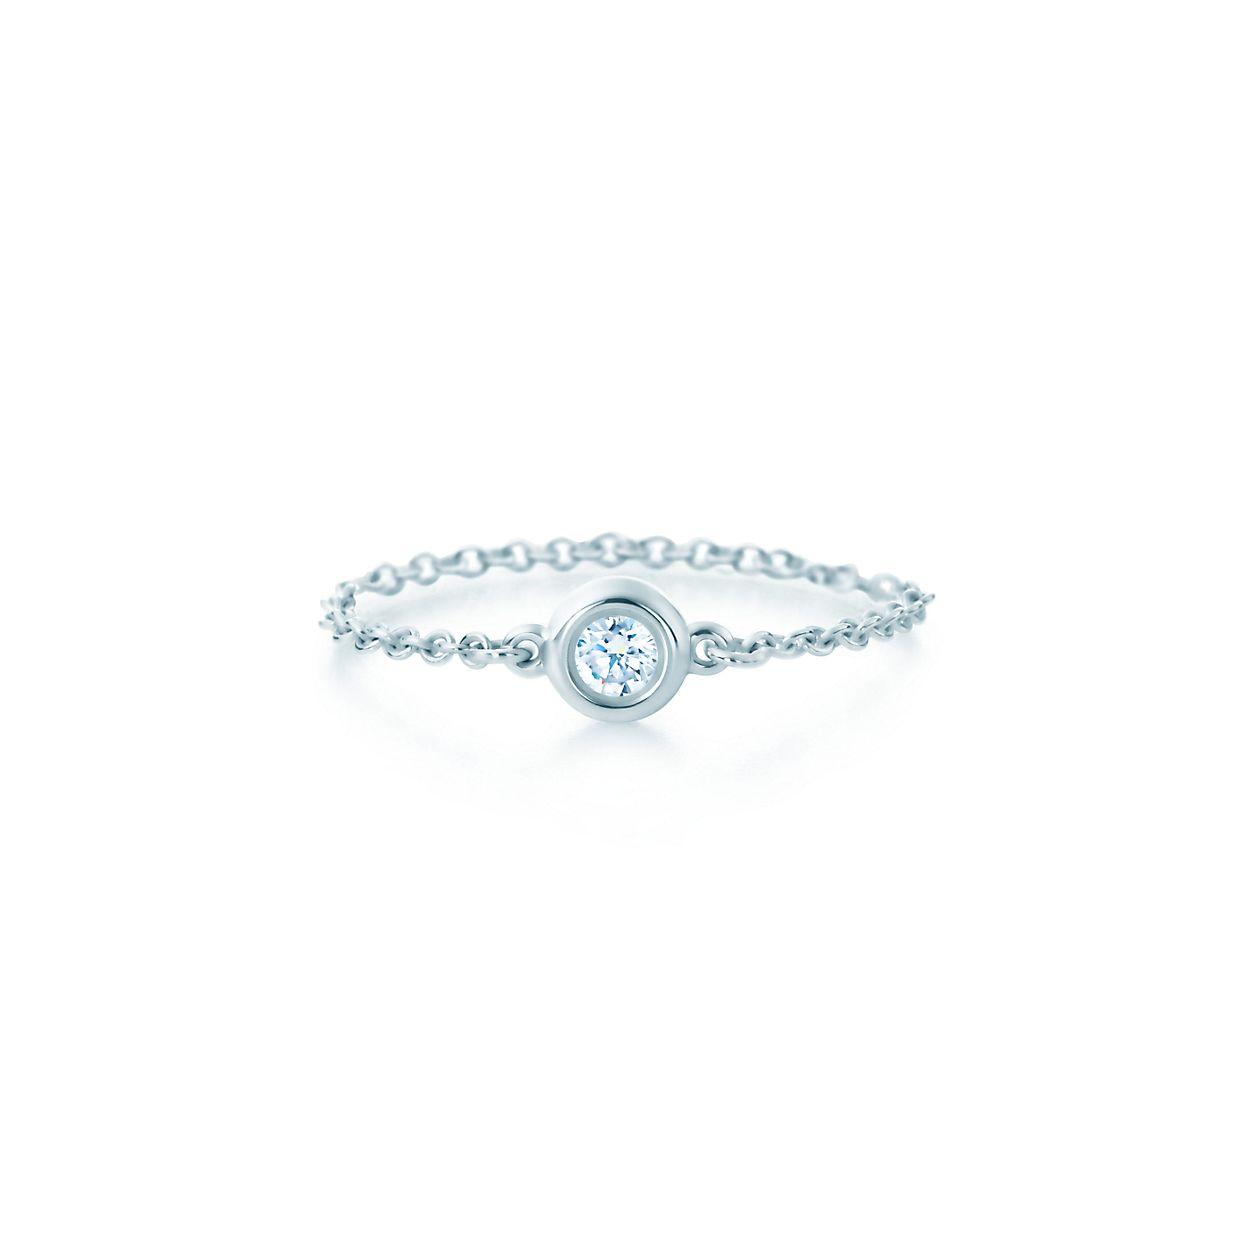 Elsa Peretti Diamonds by the Yard earrings in sterling silver - Size.10 Tiffany & Co. i3jyNAY